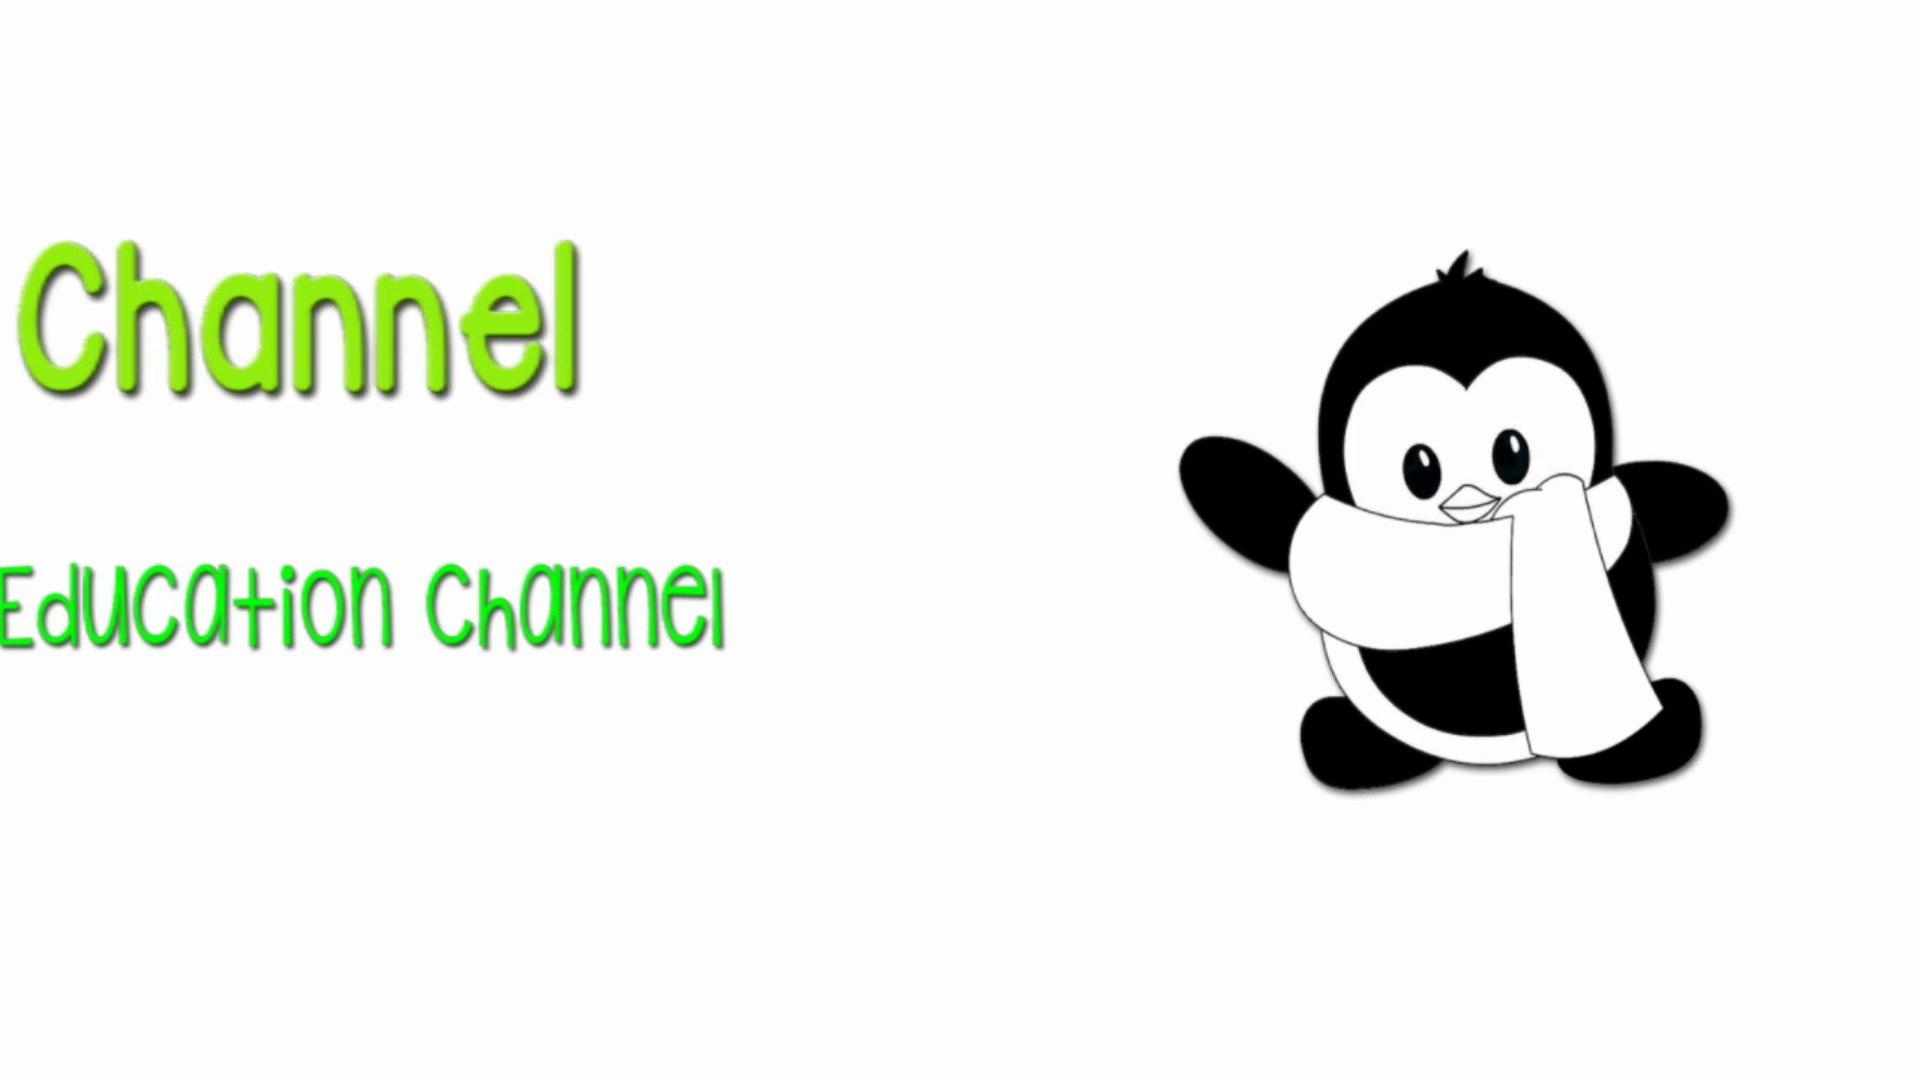 Cartoon Education. Cartoon FoR KiDs. Education Channel